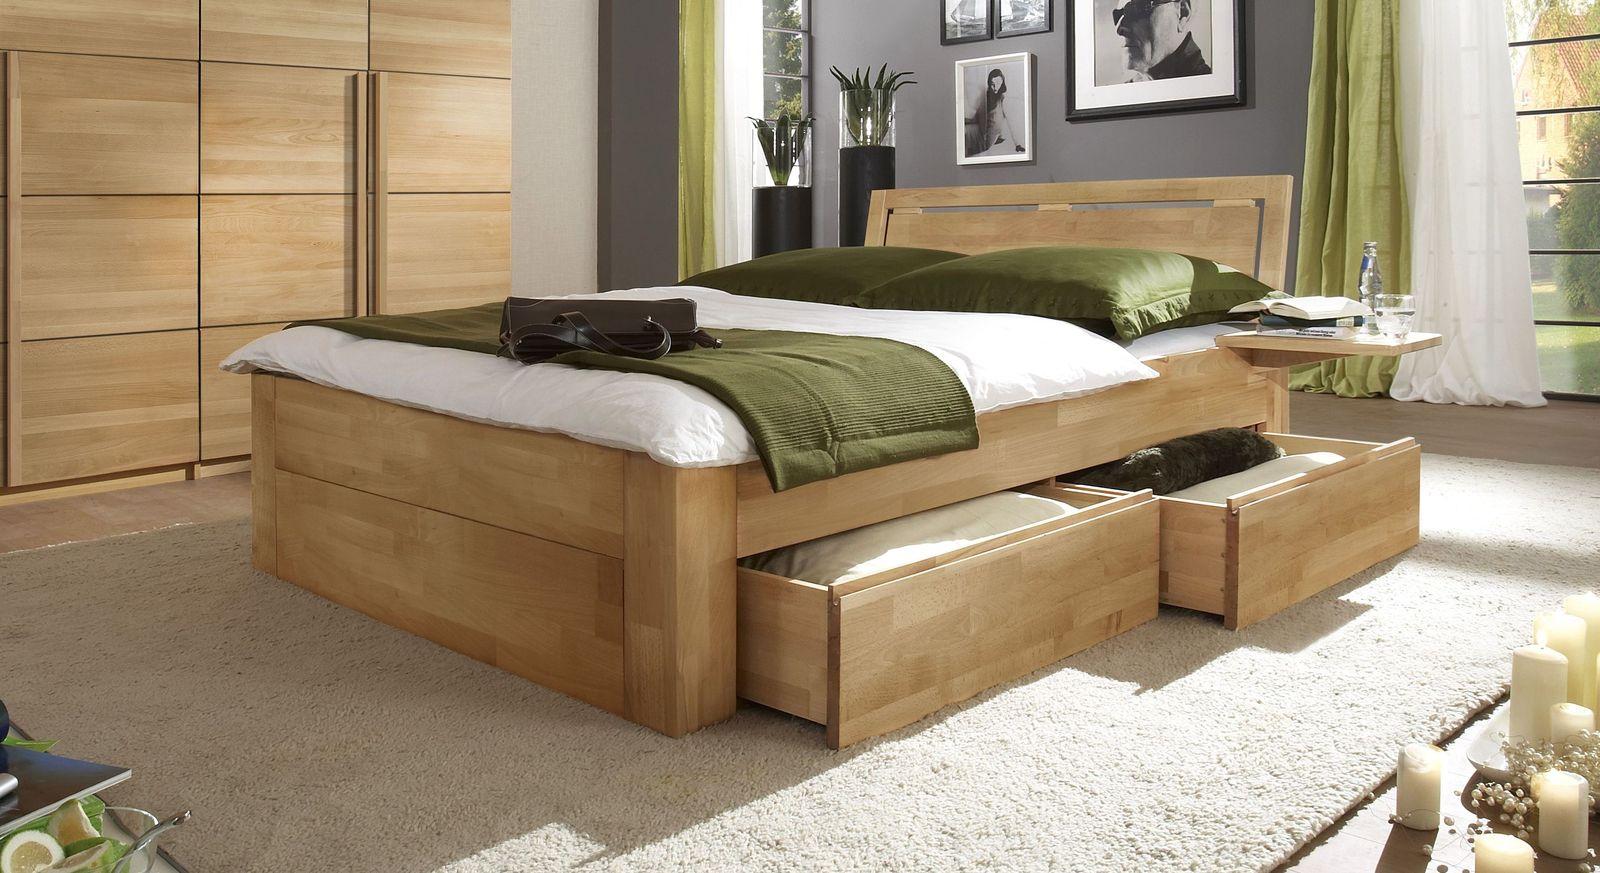 Schubkasten-Doppelbett Andalucia aus massivem Buchenholz